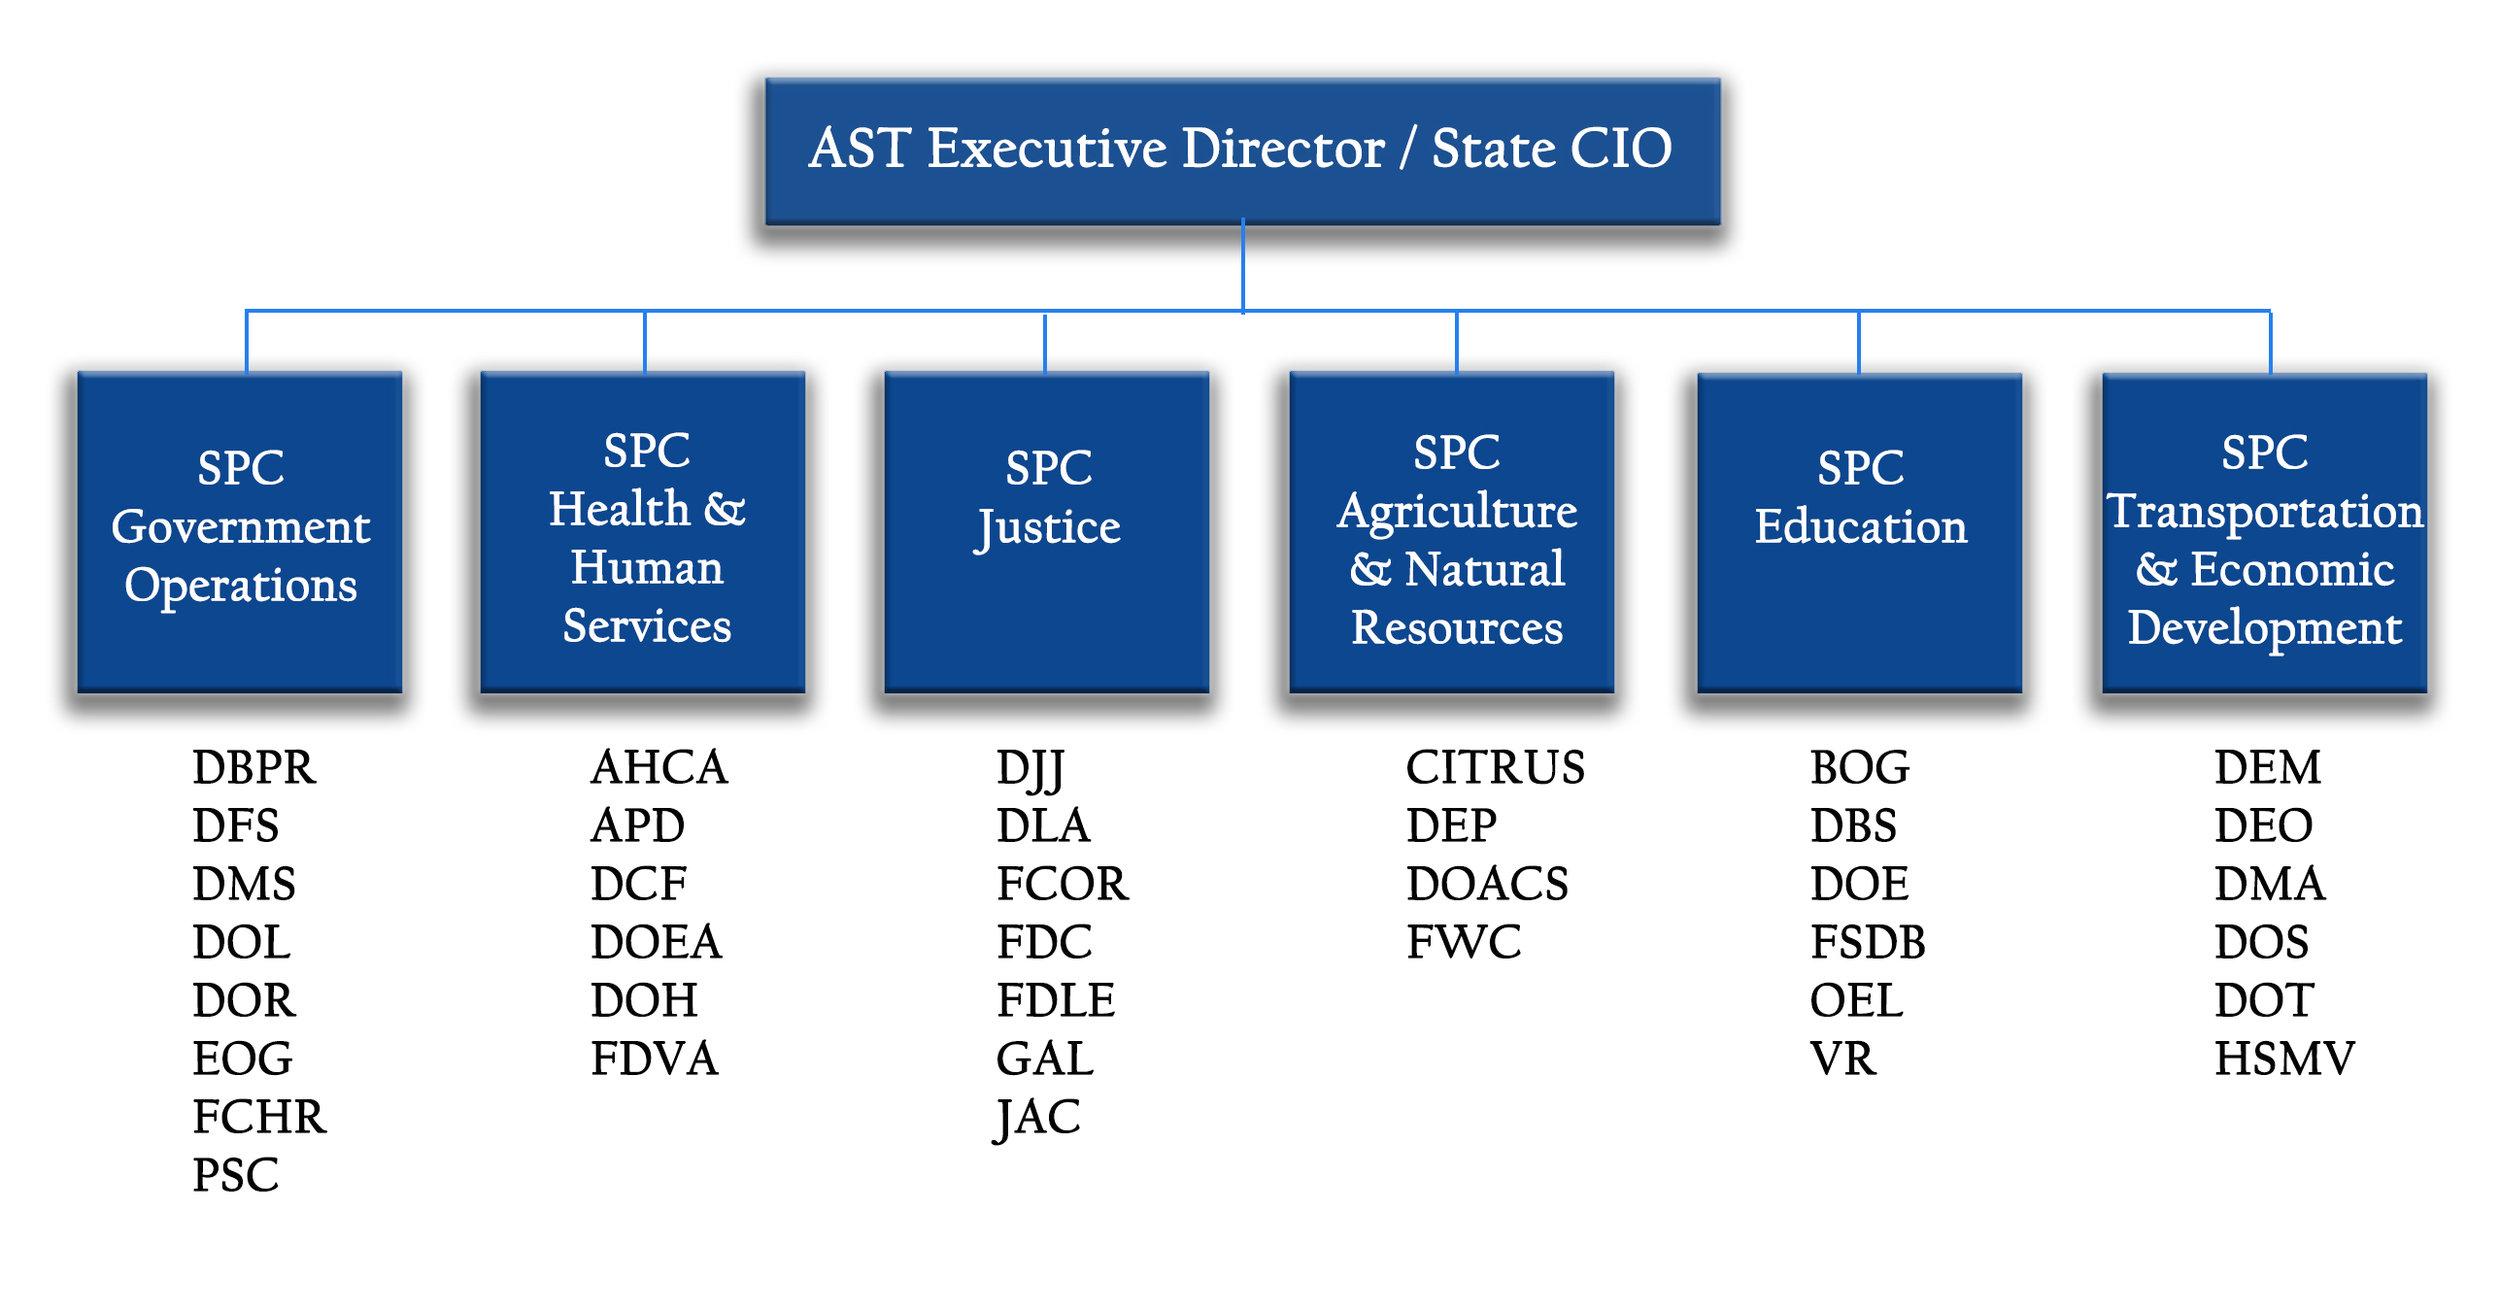 AST Strategic Planning Coordinators - roles and agencies served.